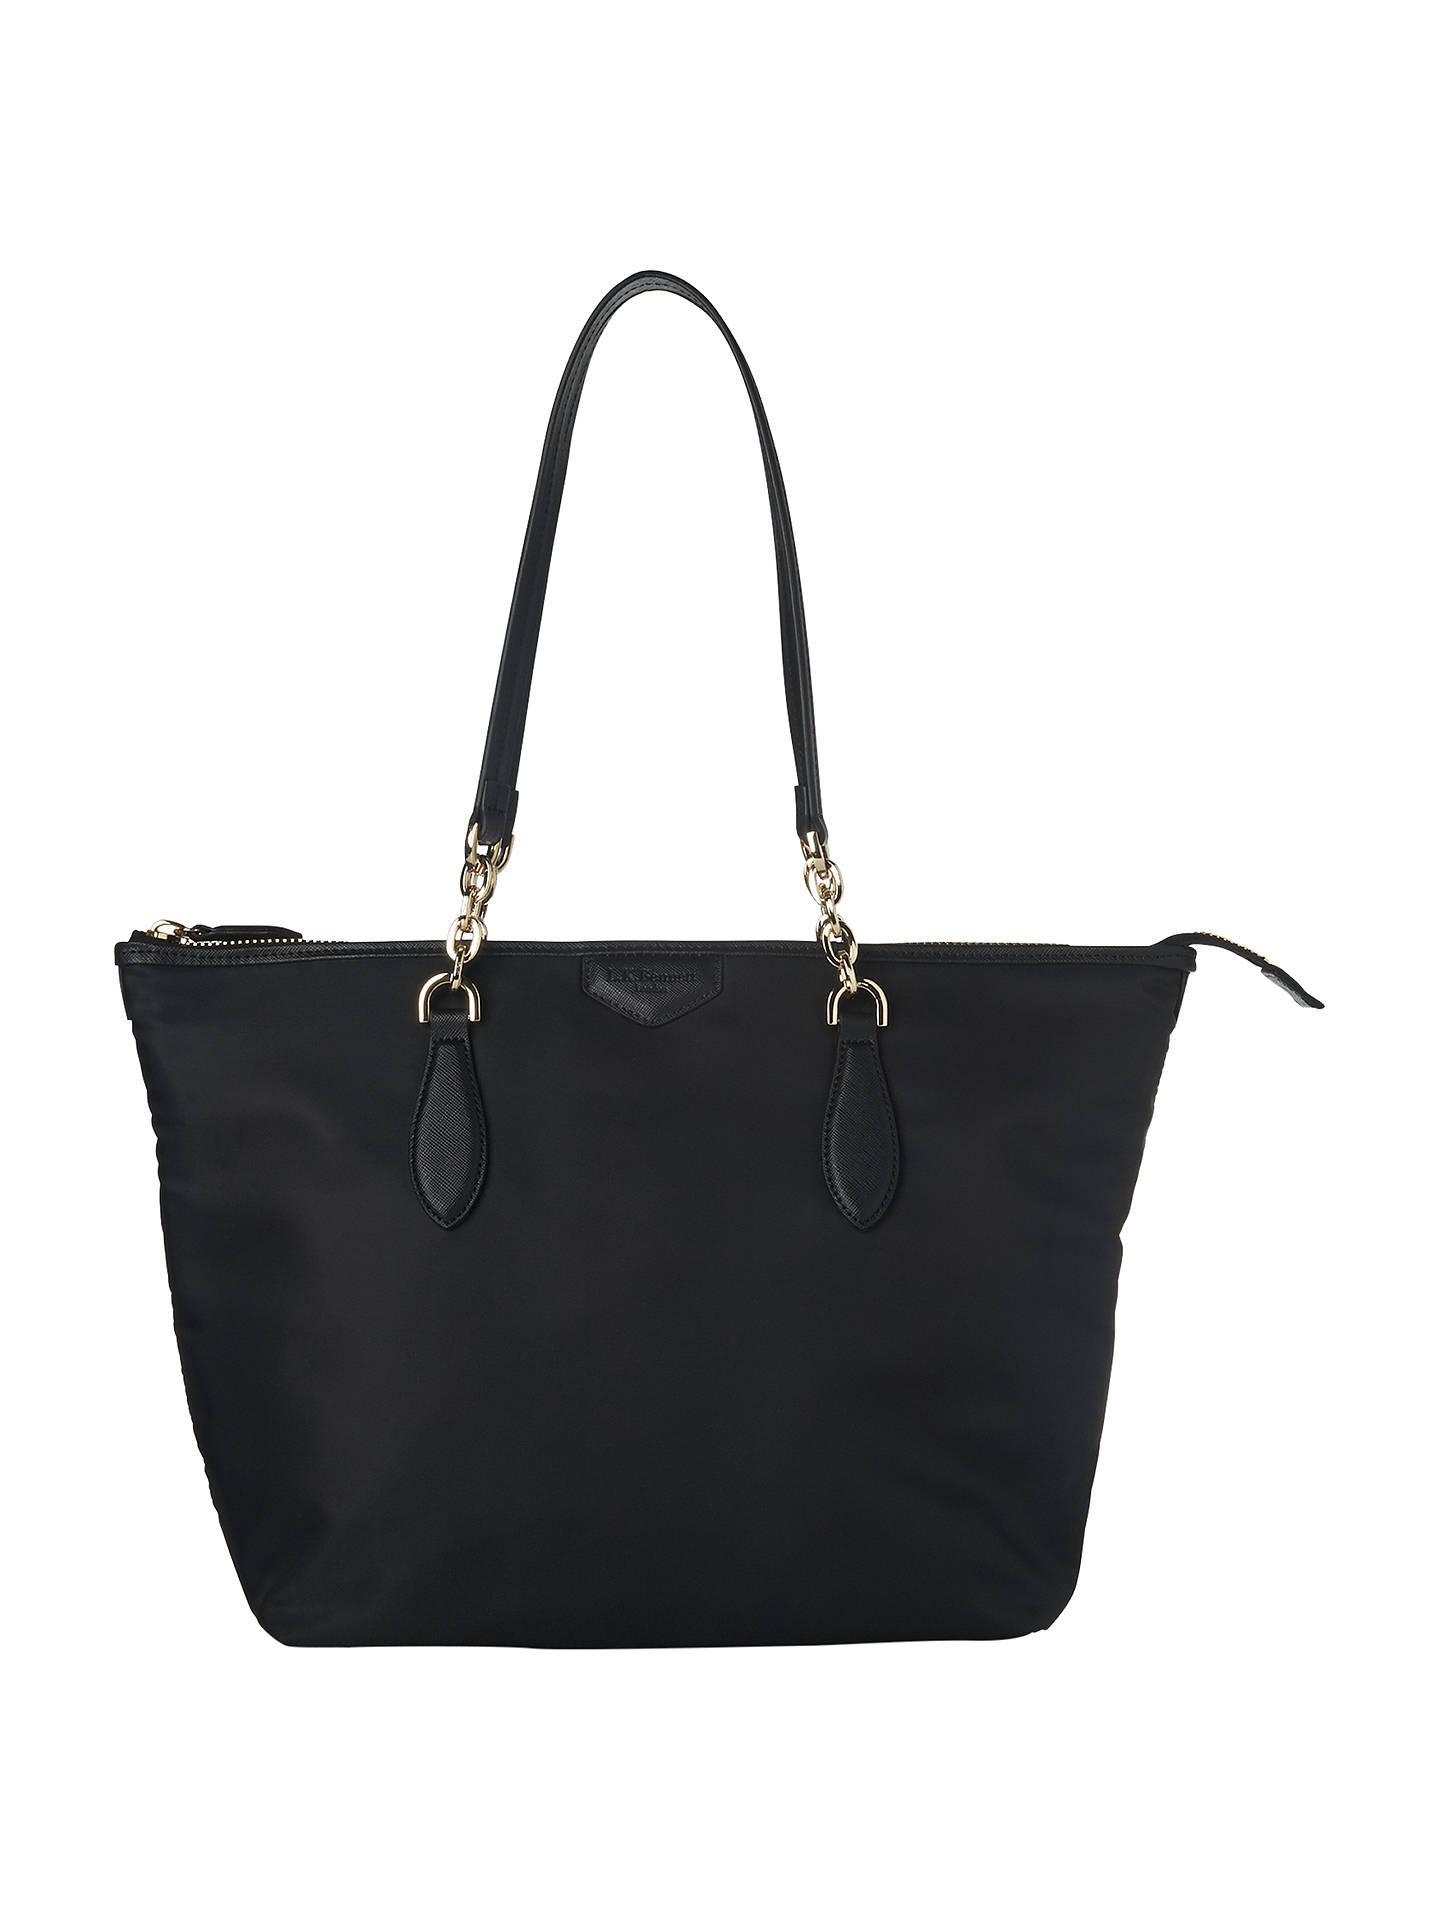 5bc9e2e0b5f Buy L.K.Bennett Brooke Tote Bag, Black Online at johnlewis.com ...